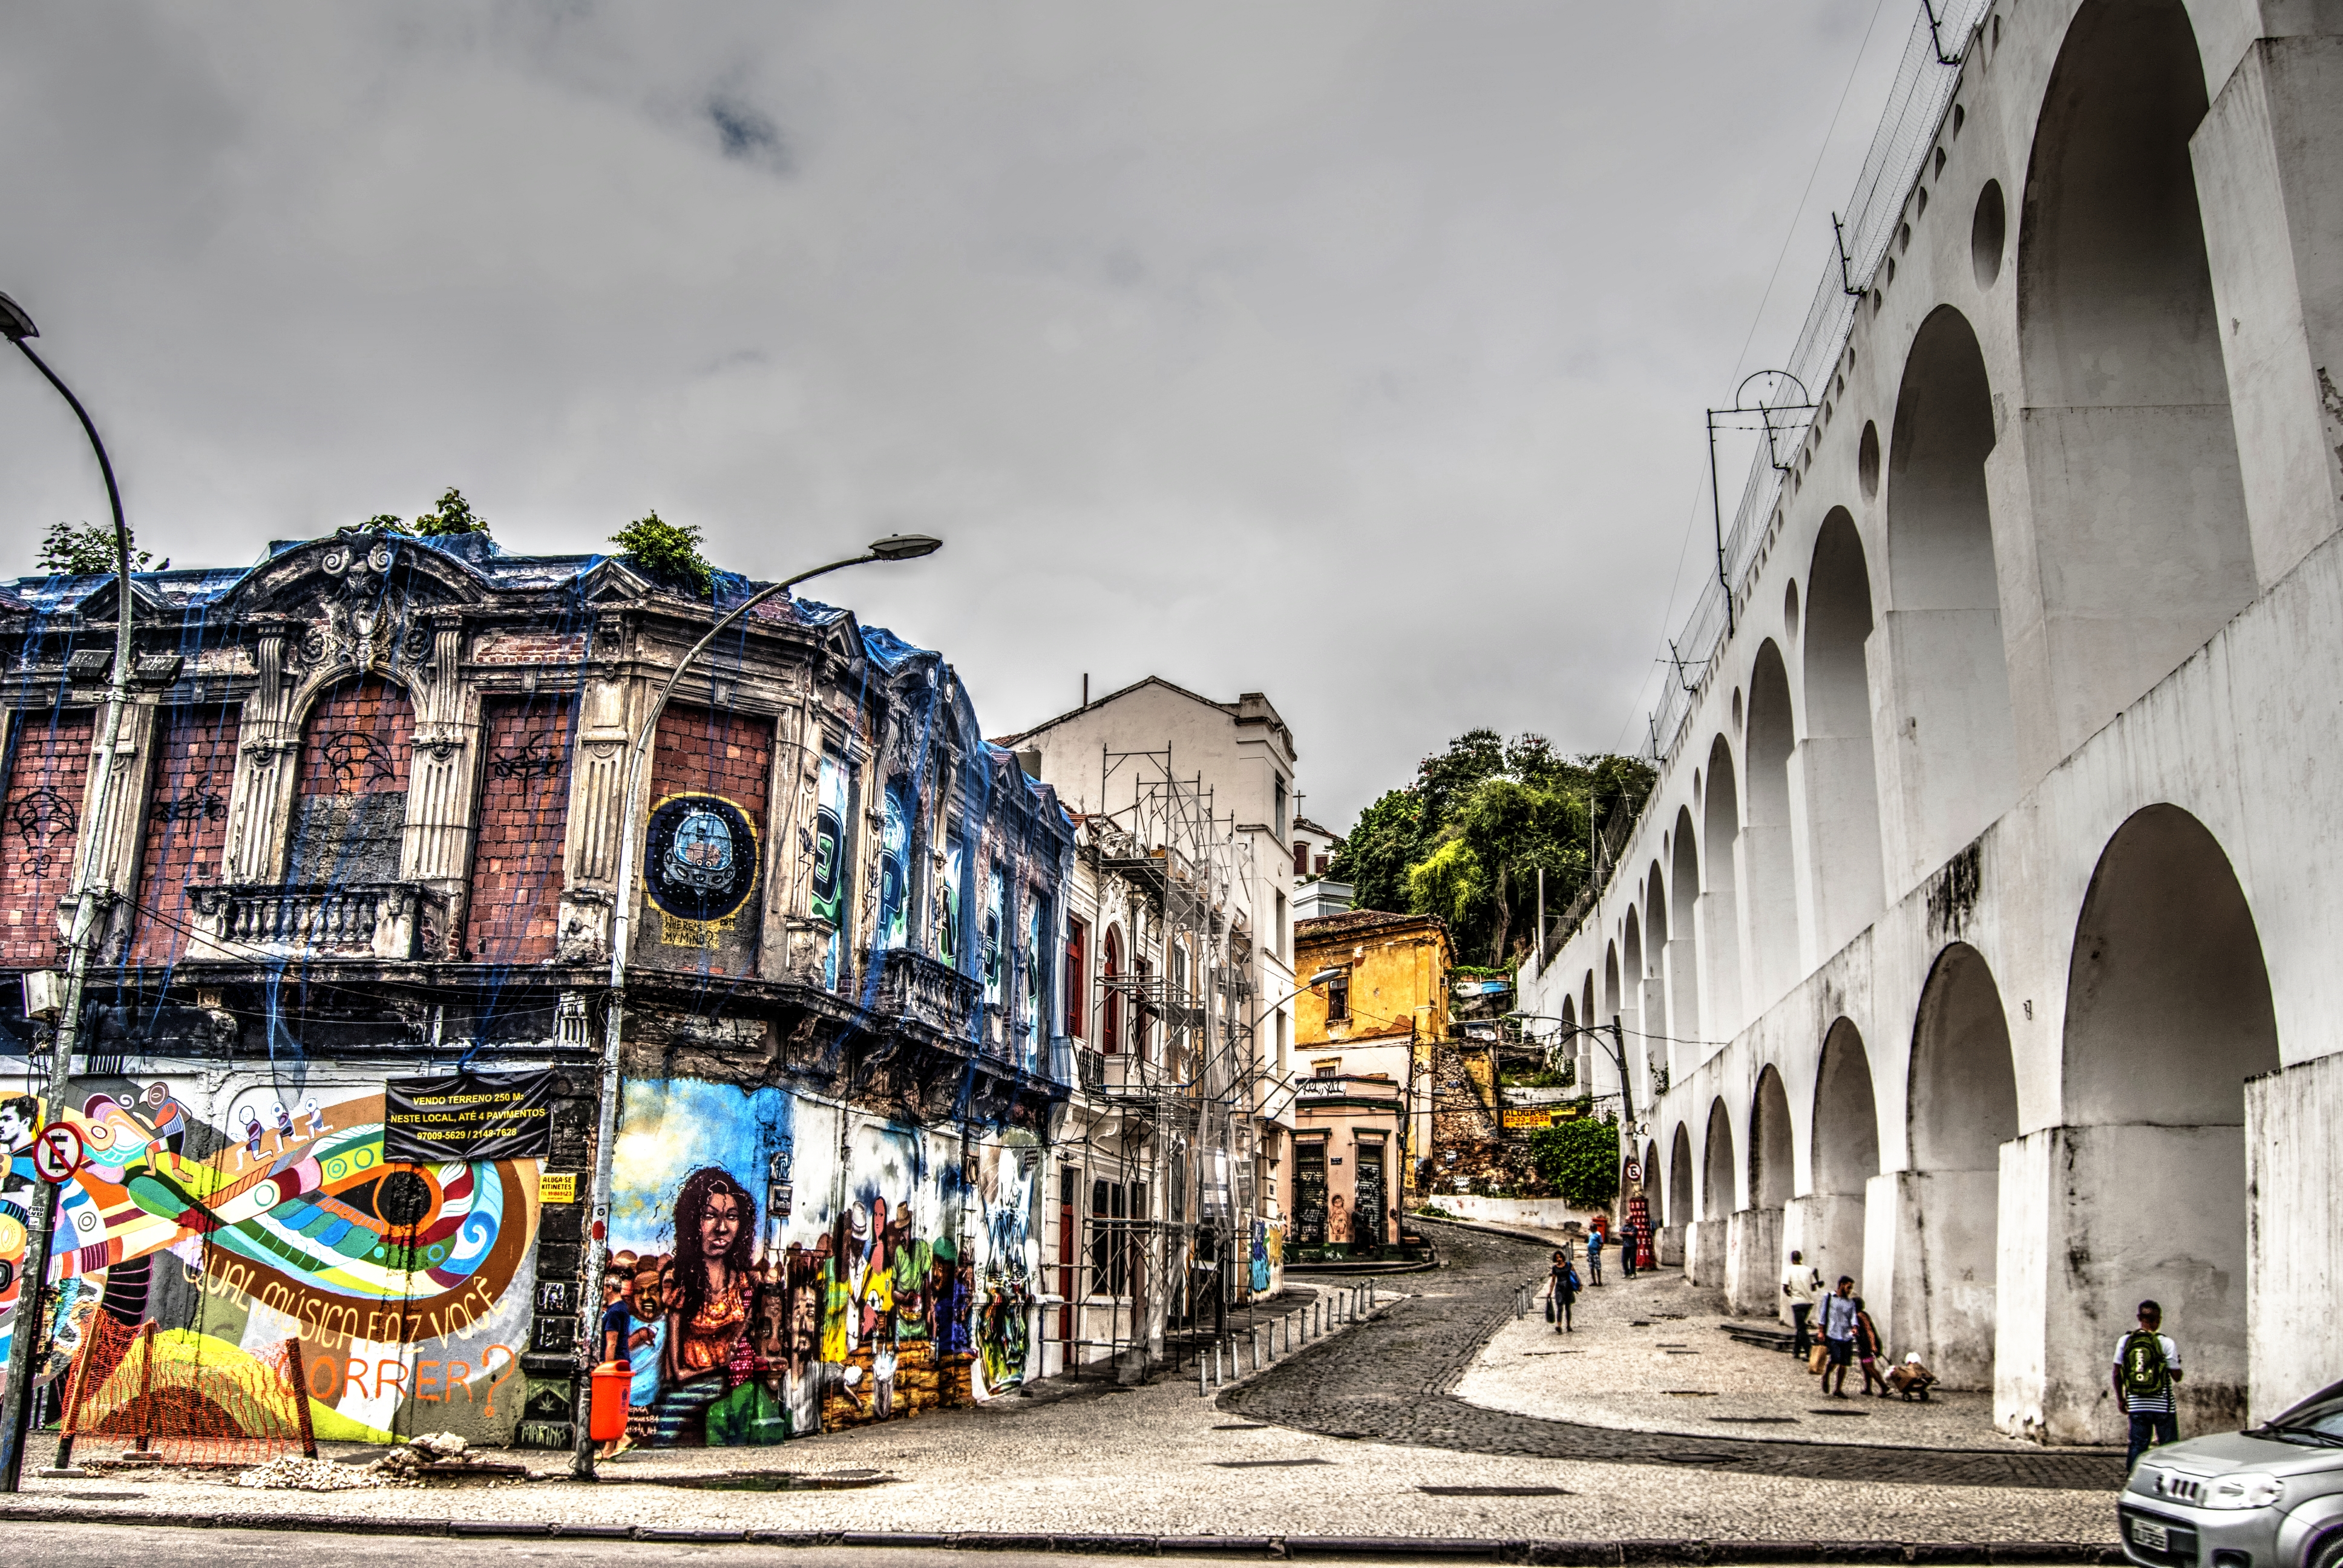 File:Arcos da lapa Rio de Janeiro.jpg - Wikimedia Commons